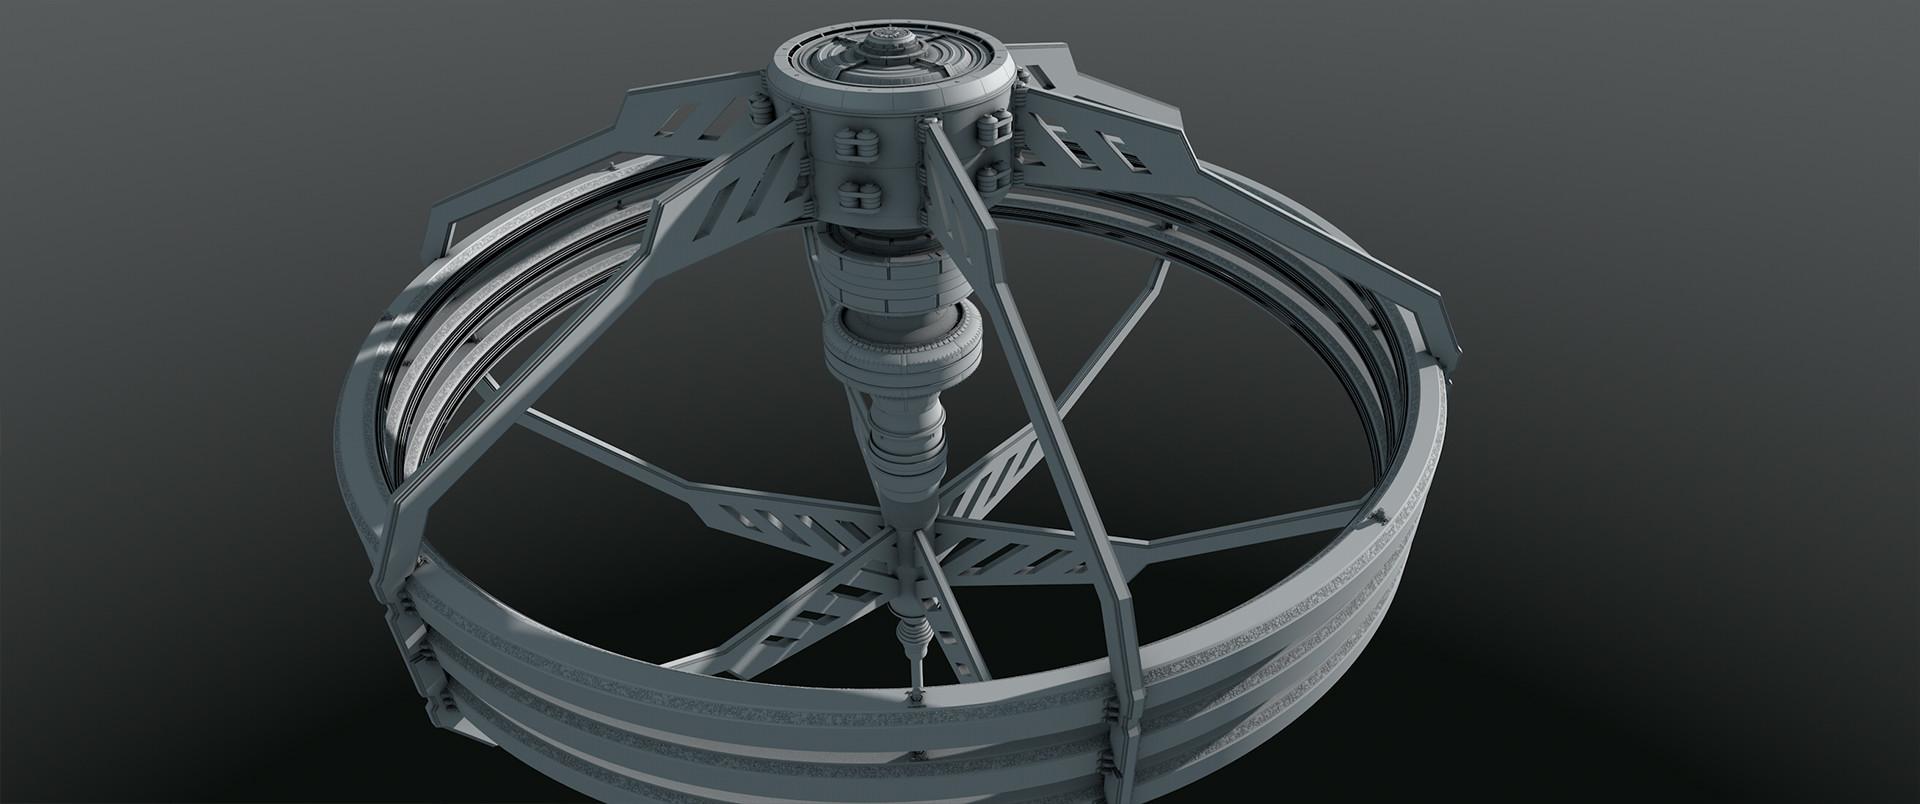 Glenn clovis spacestation concept 9 004